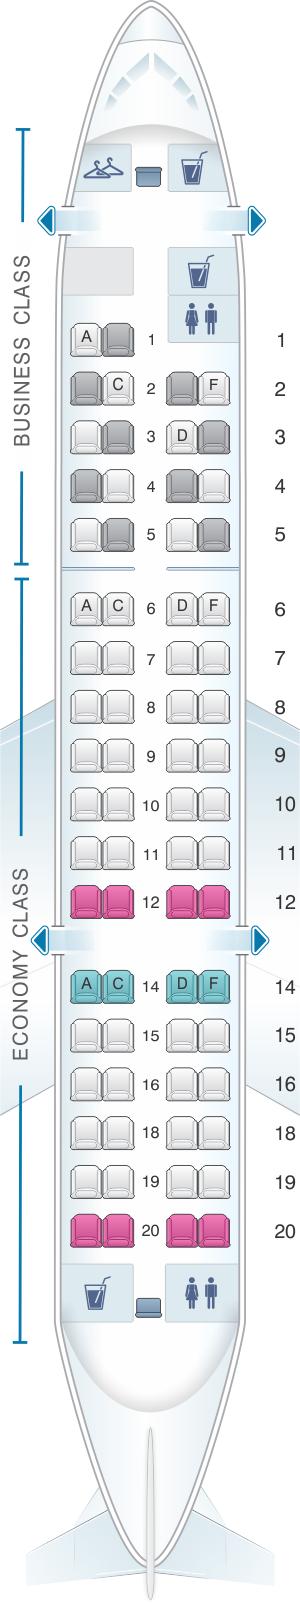 Seat map for Lufthansa Bombardier Canadair CRJ 700